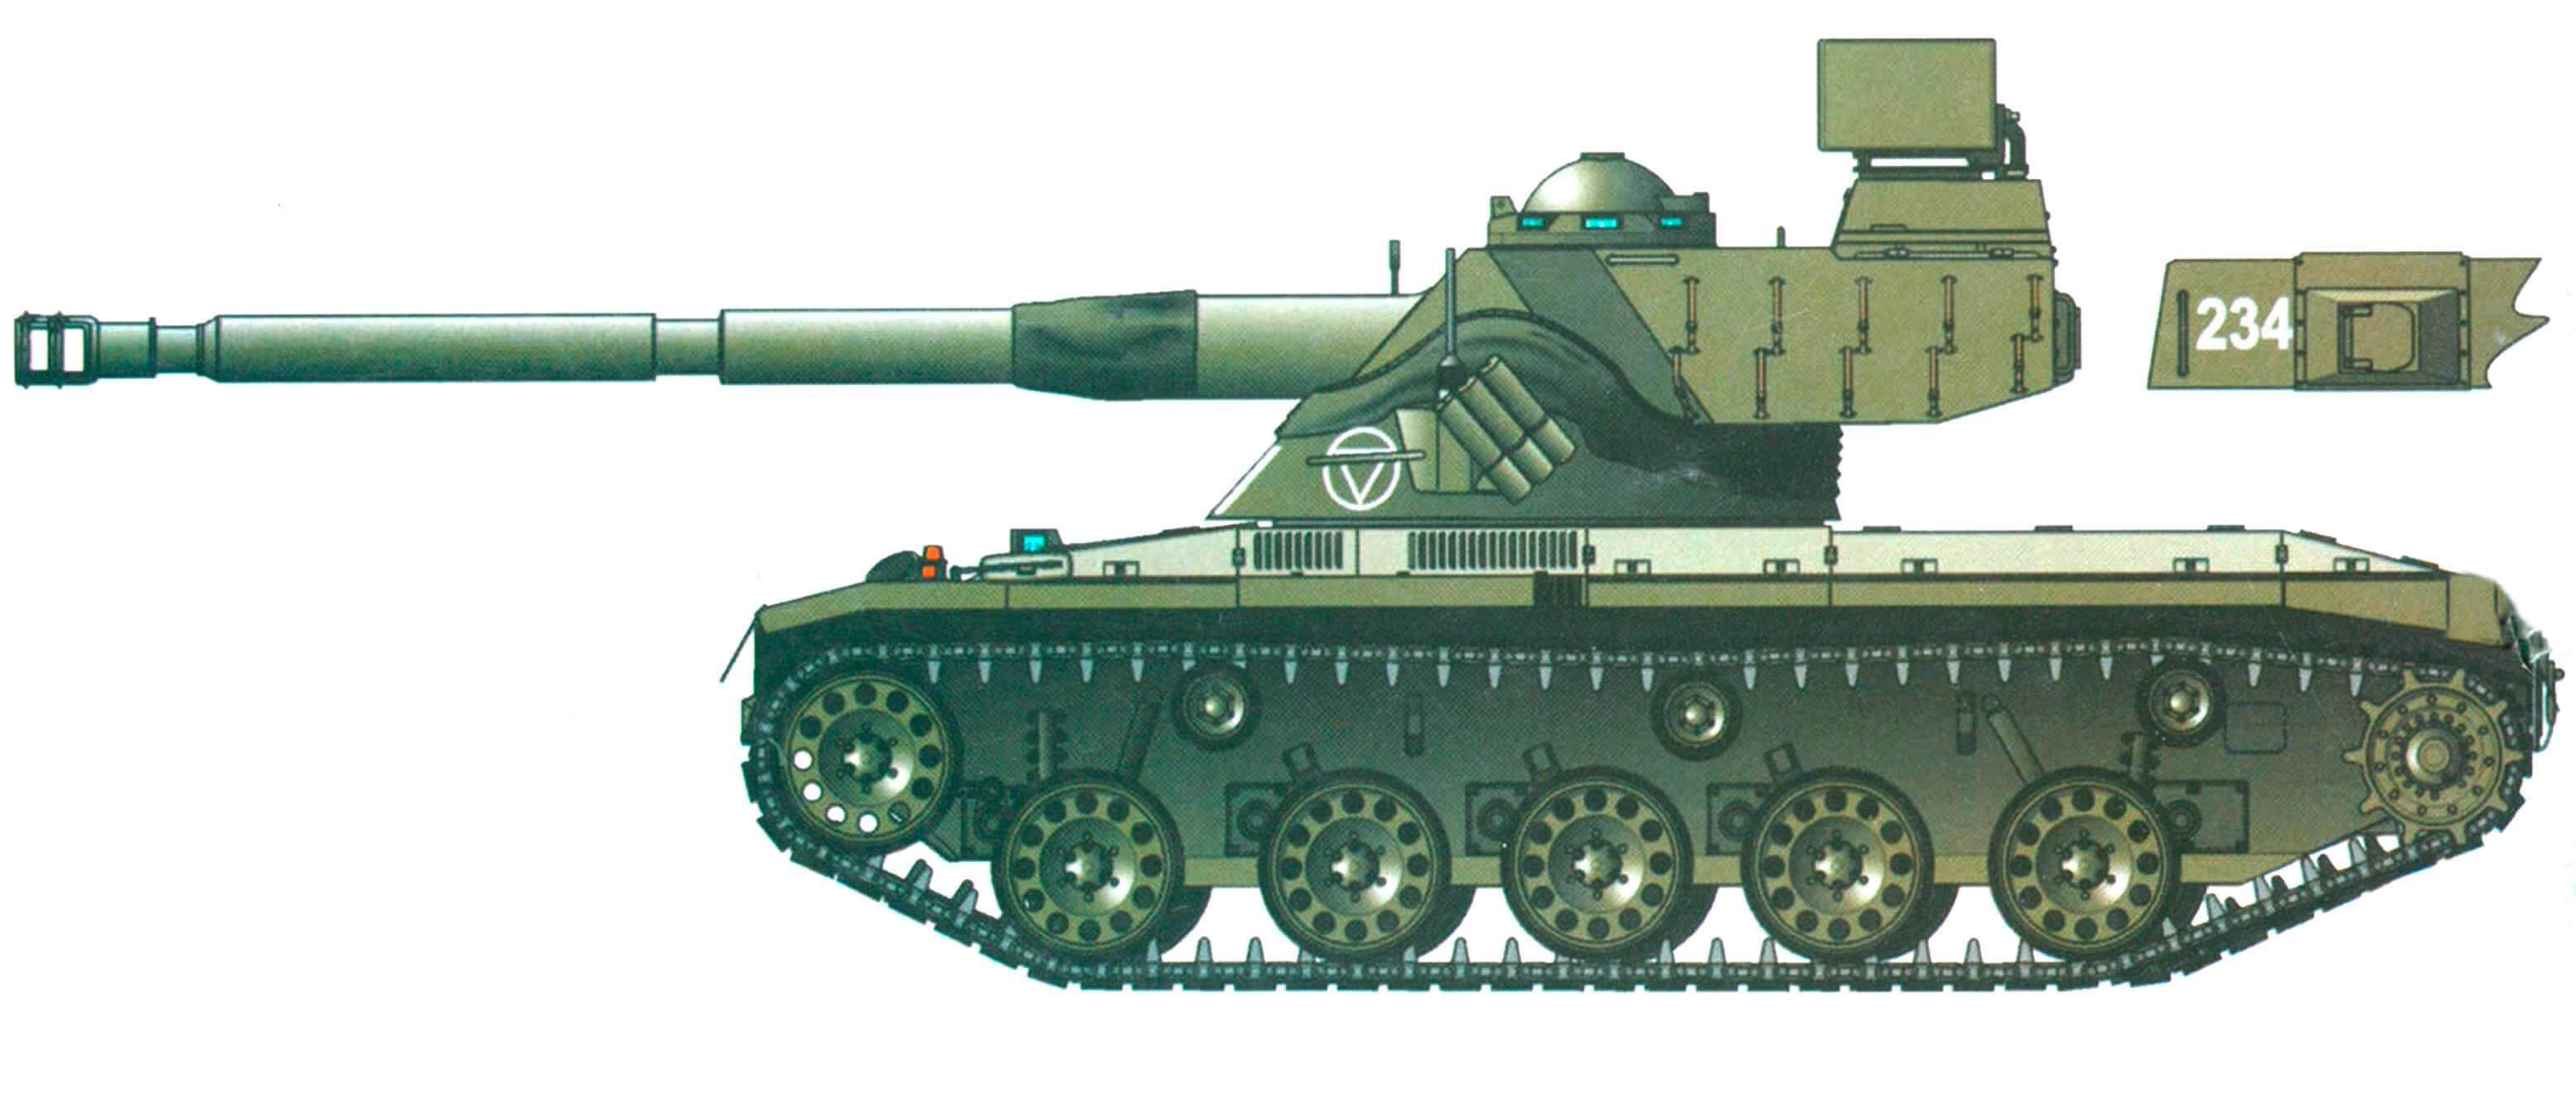 "SK-105 ""Кирасир"" австрийской армии в окраске 1970 - 1980 годов"